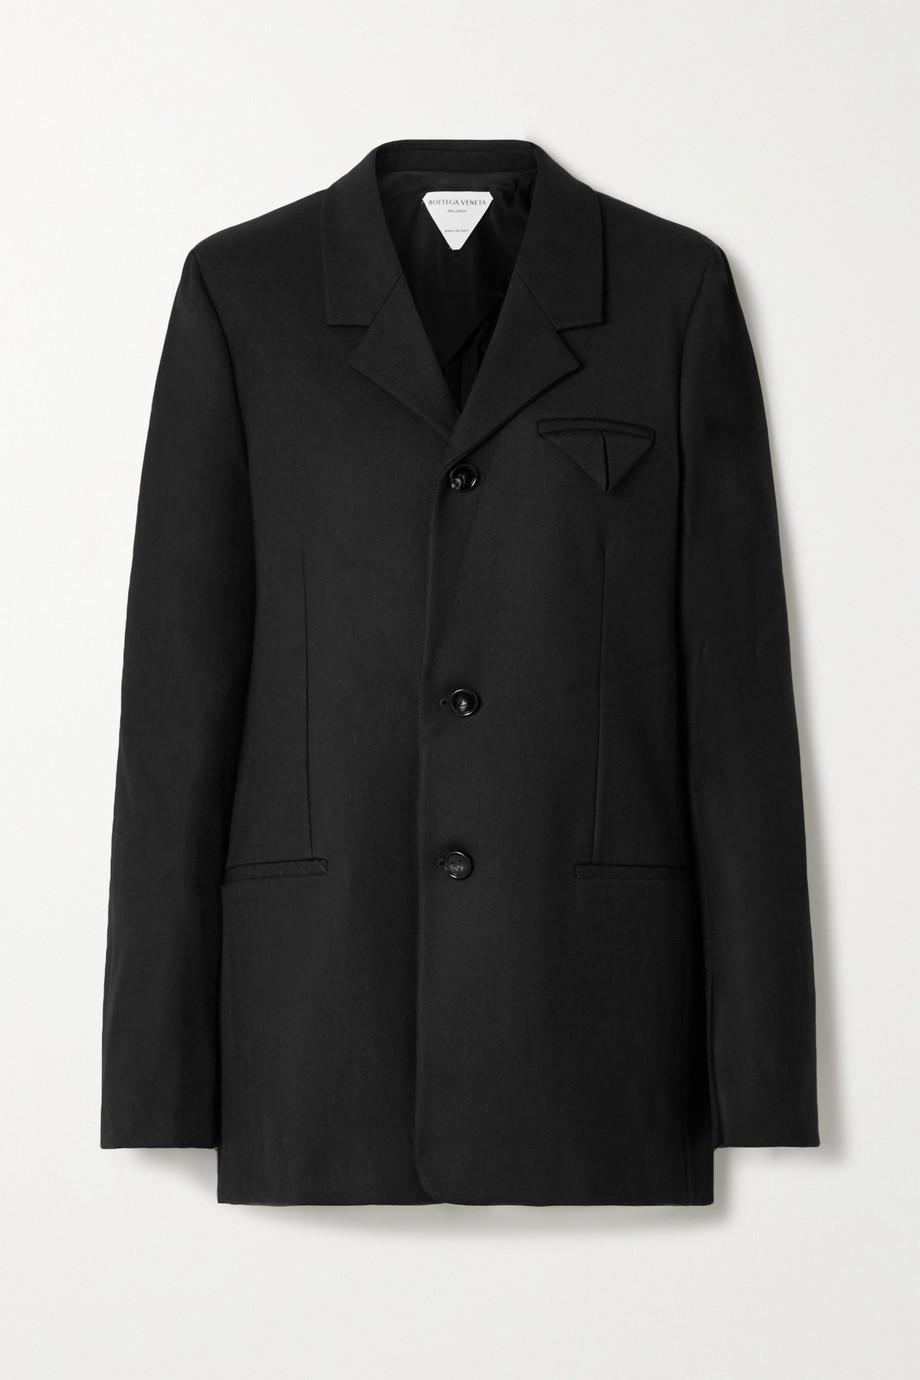 Bottega Veneta 斜纹布西装外套